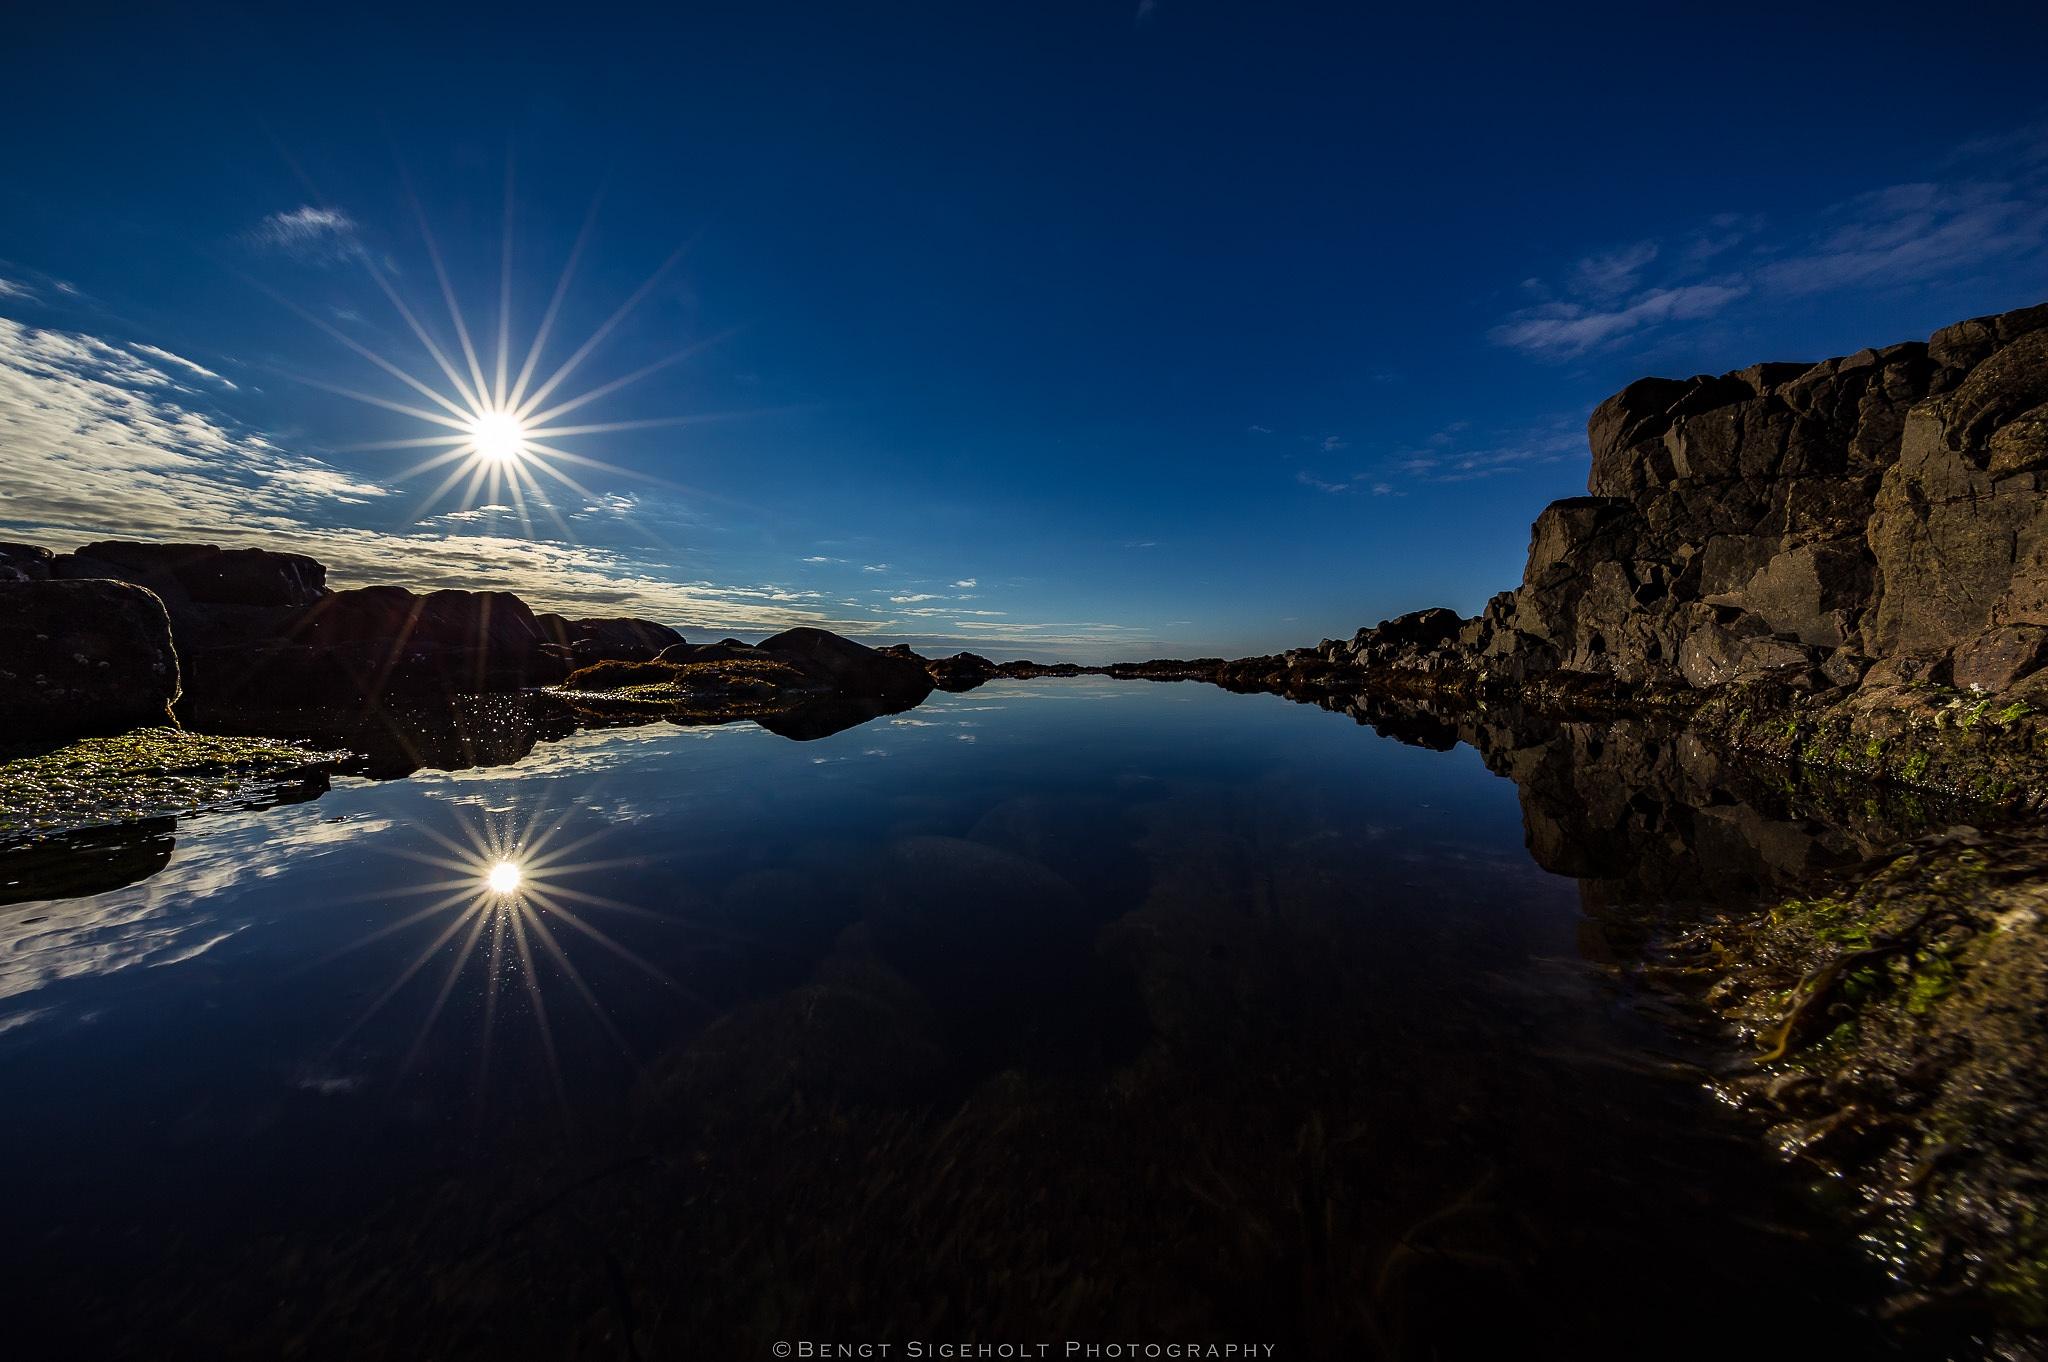 Blue Reflection. by Bengt Sigeholt Photography